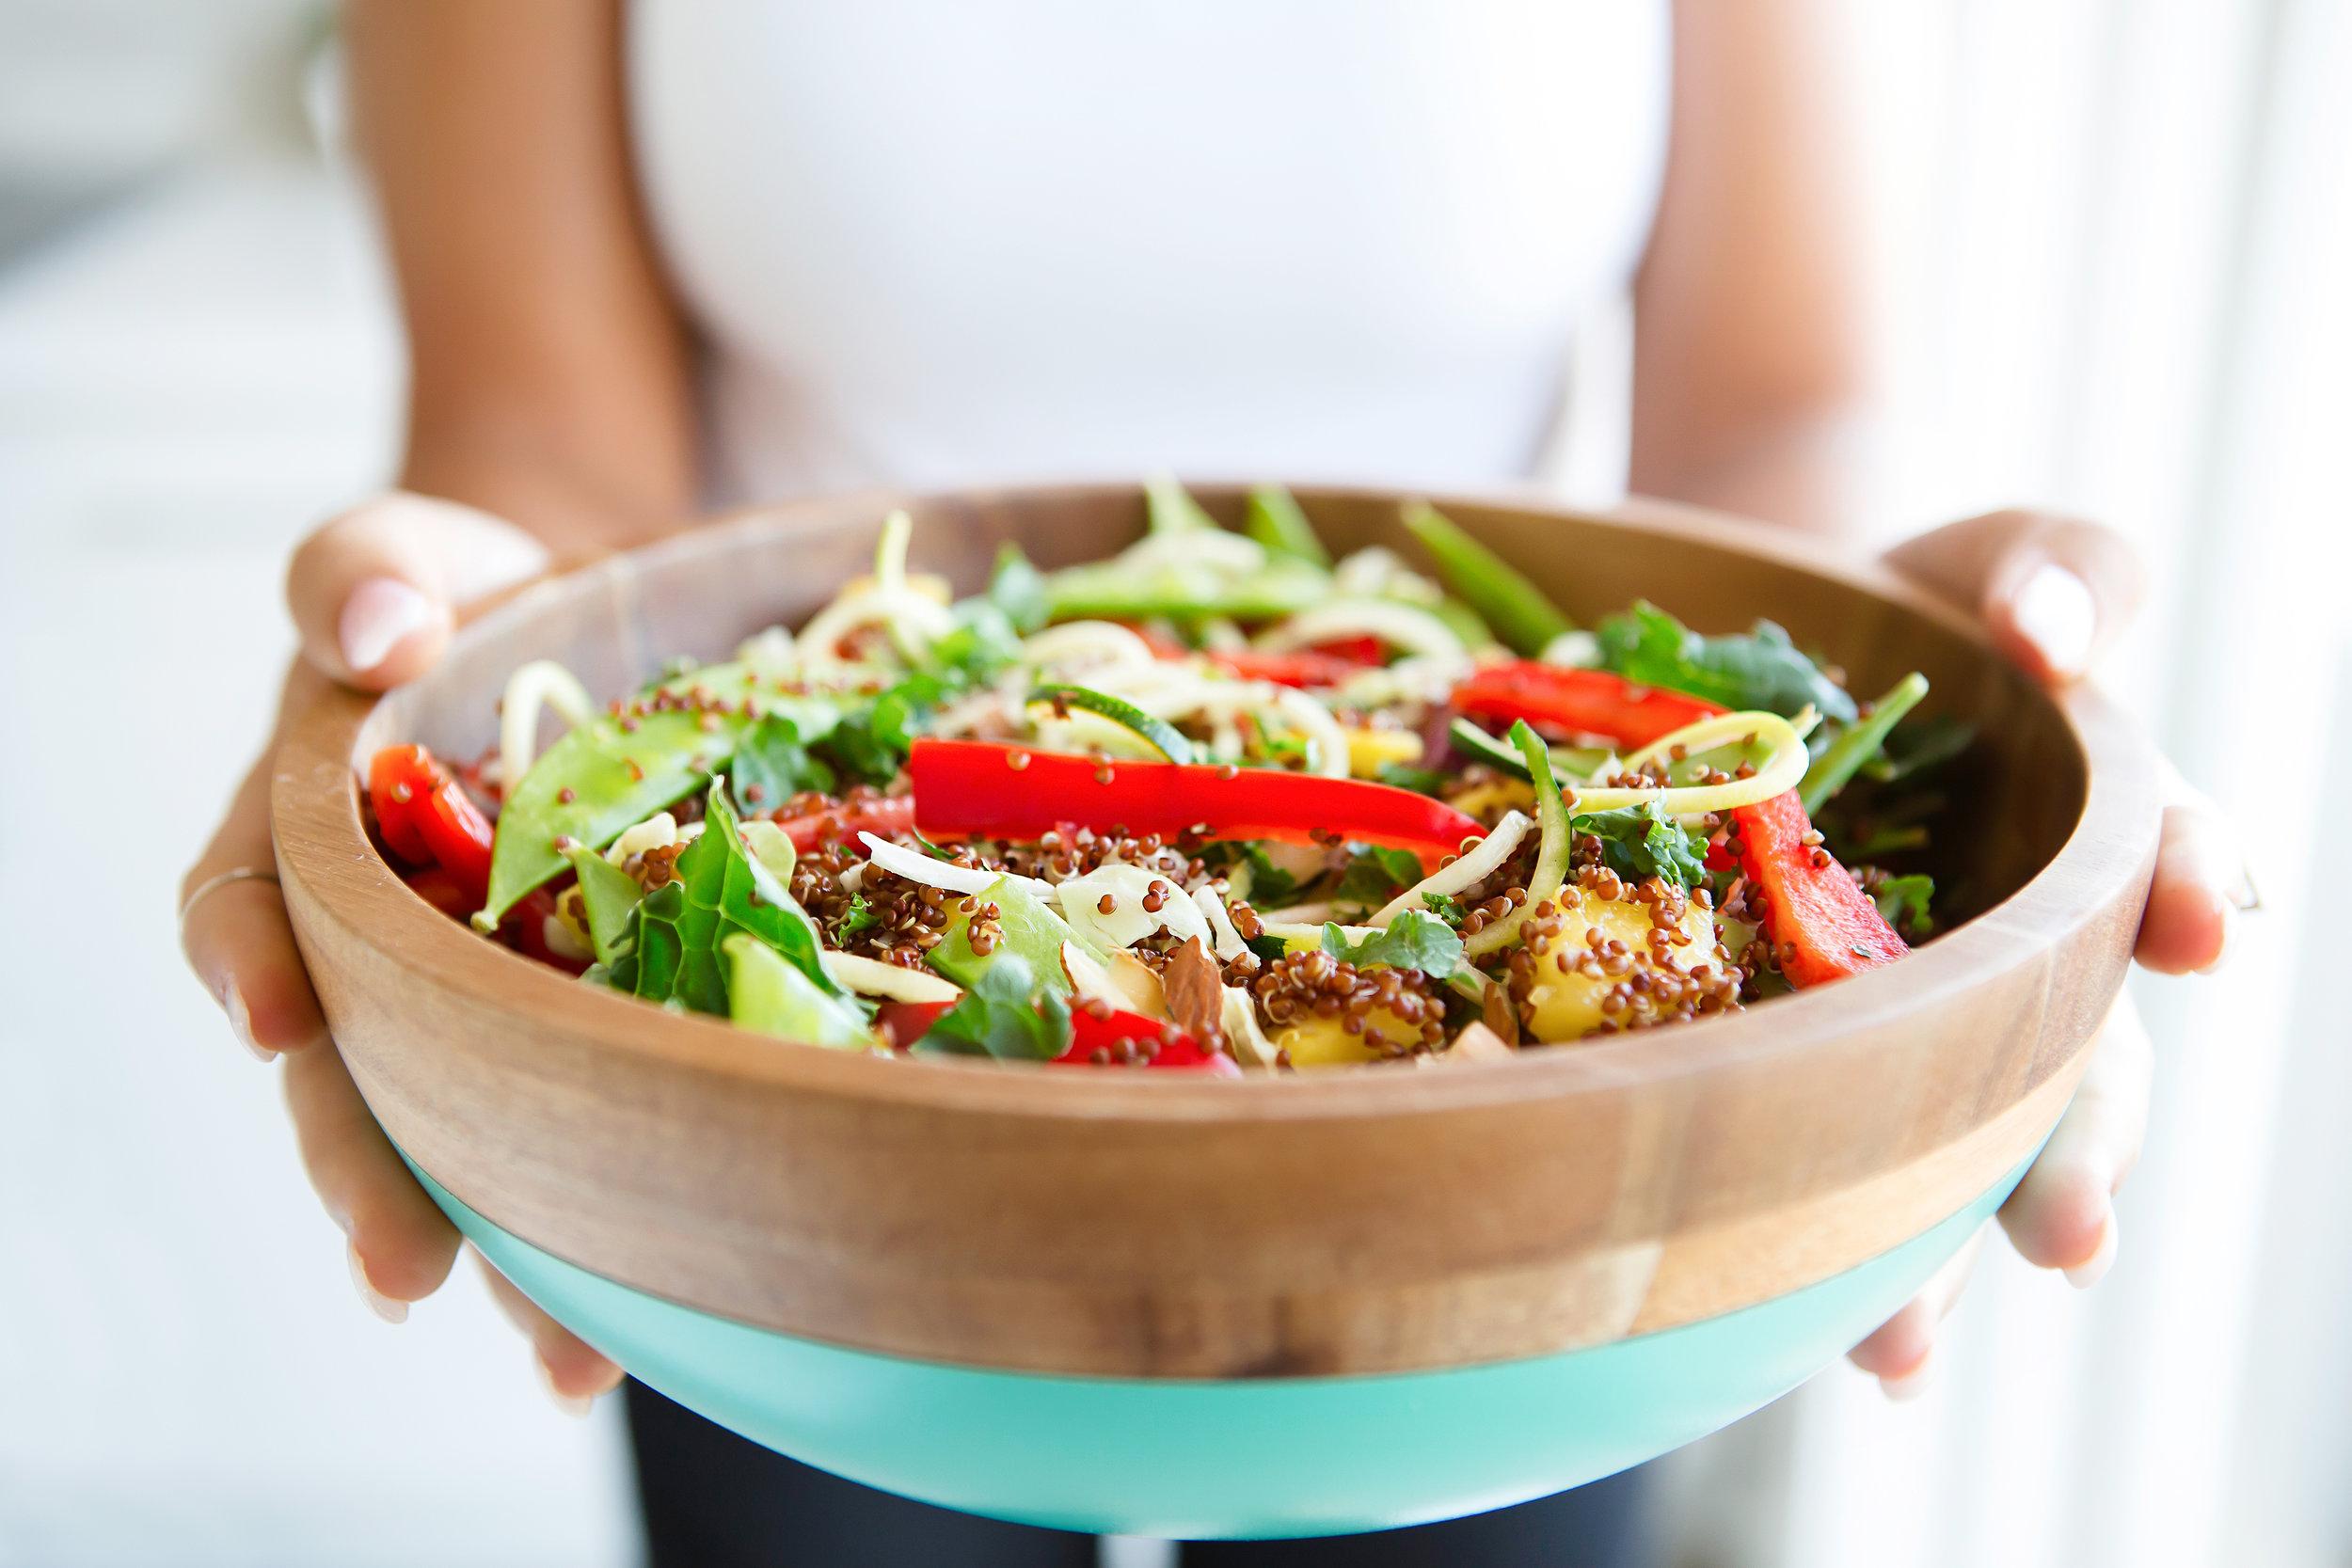 haute-stock-photography-healthy-food-nutrition-final-42.jpg